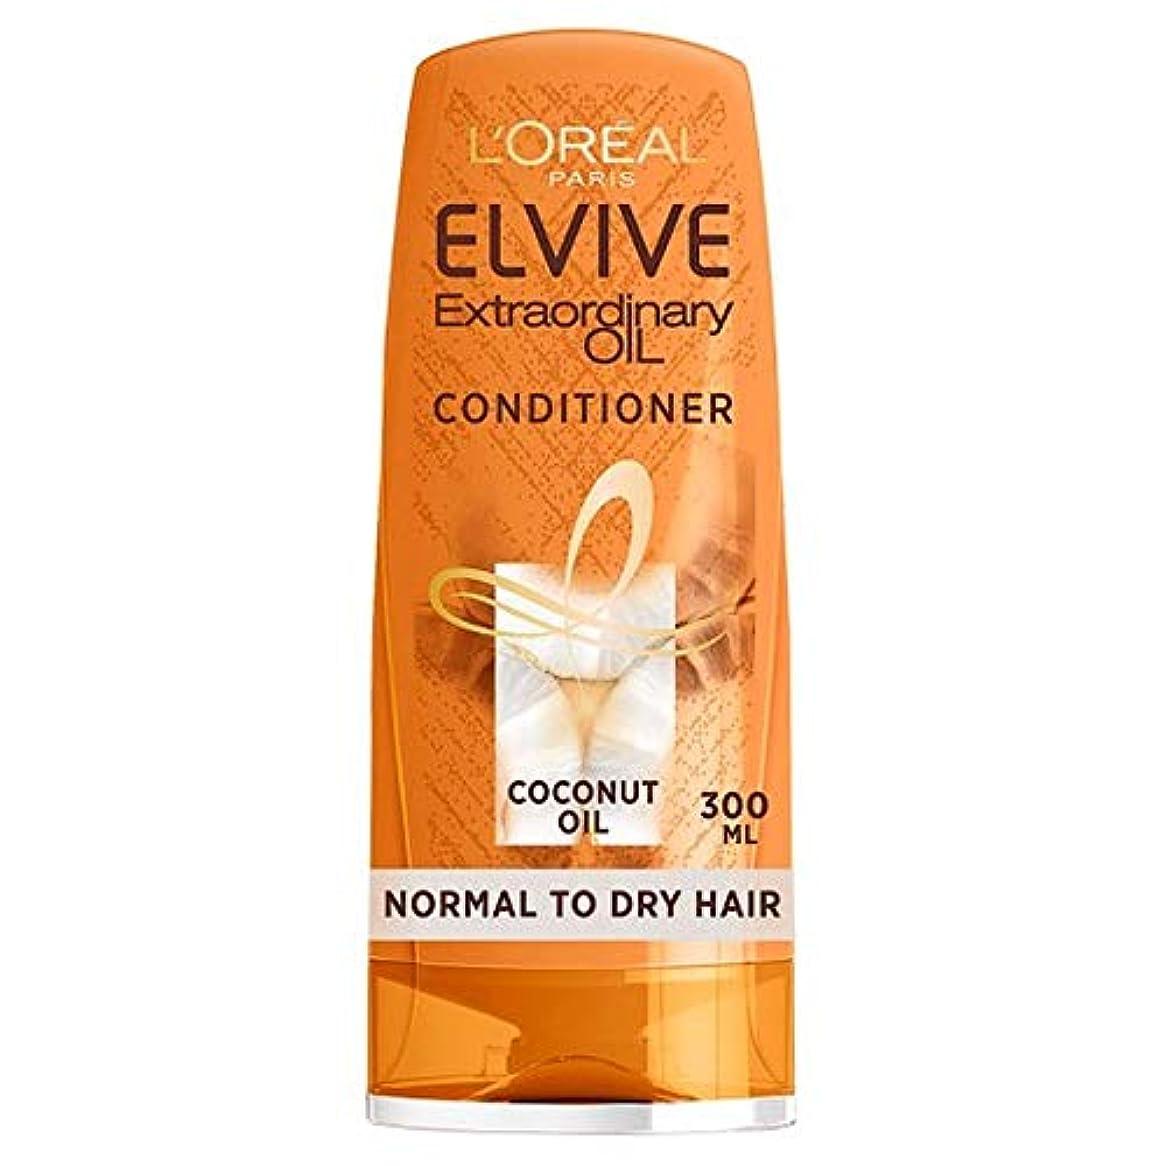 [Elvive] ロレアルElvive臨時ココナッツオイルコンディショナー300ミリリットル - L'oreal Elvive Extraordinary Coconut Oil Conditioner 300Ml [並行輸入品]